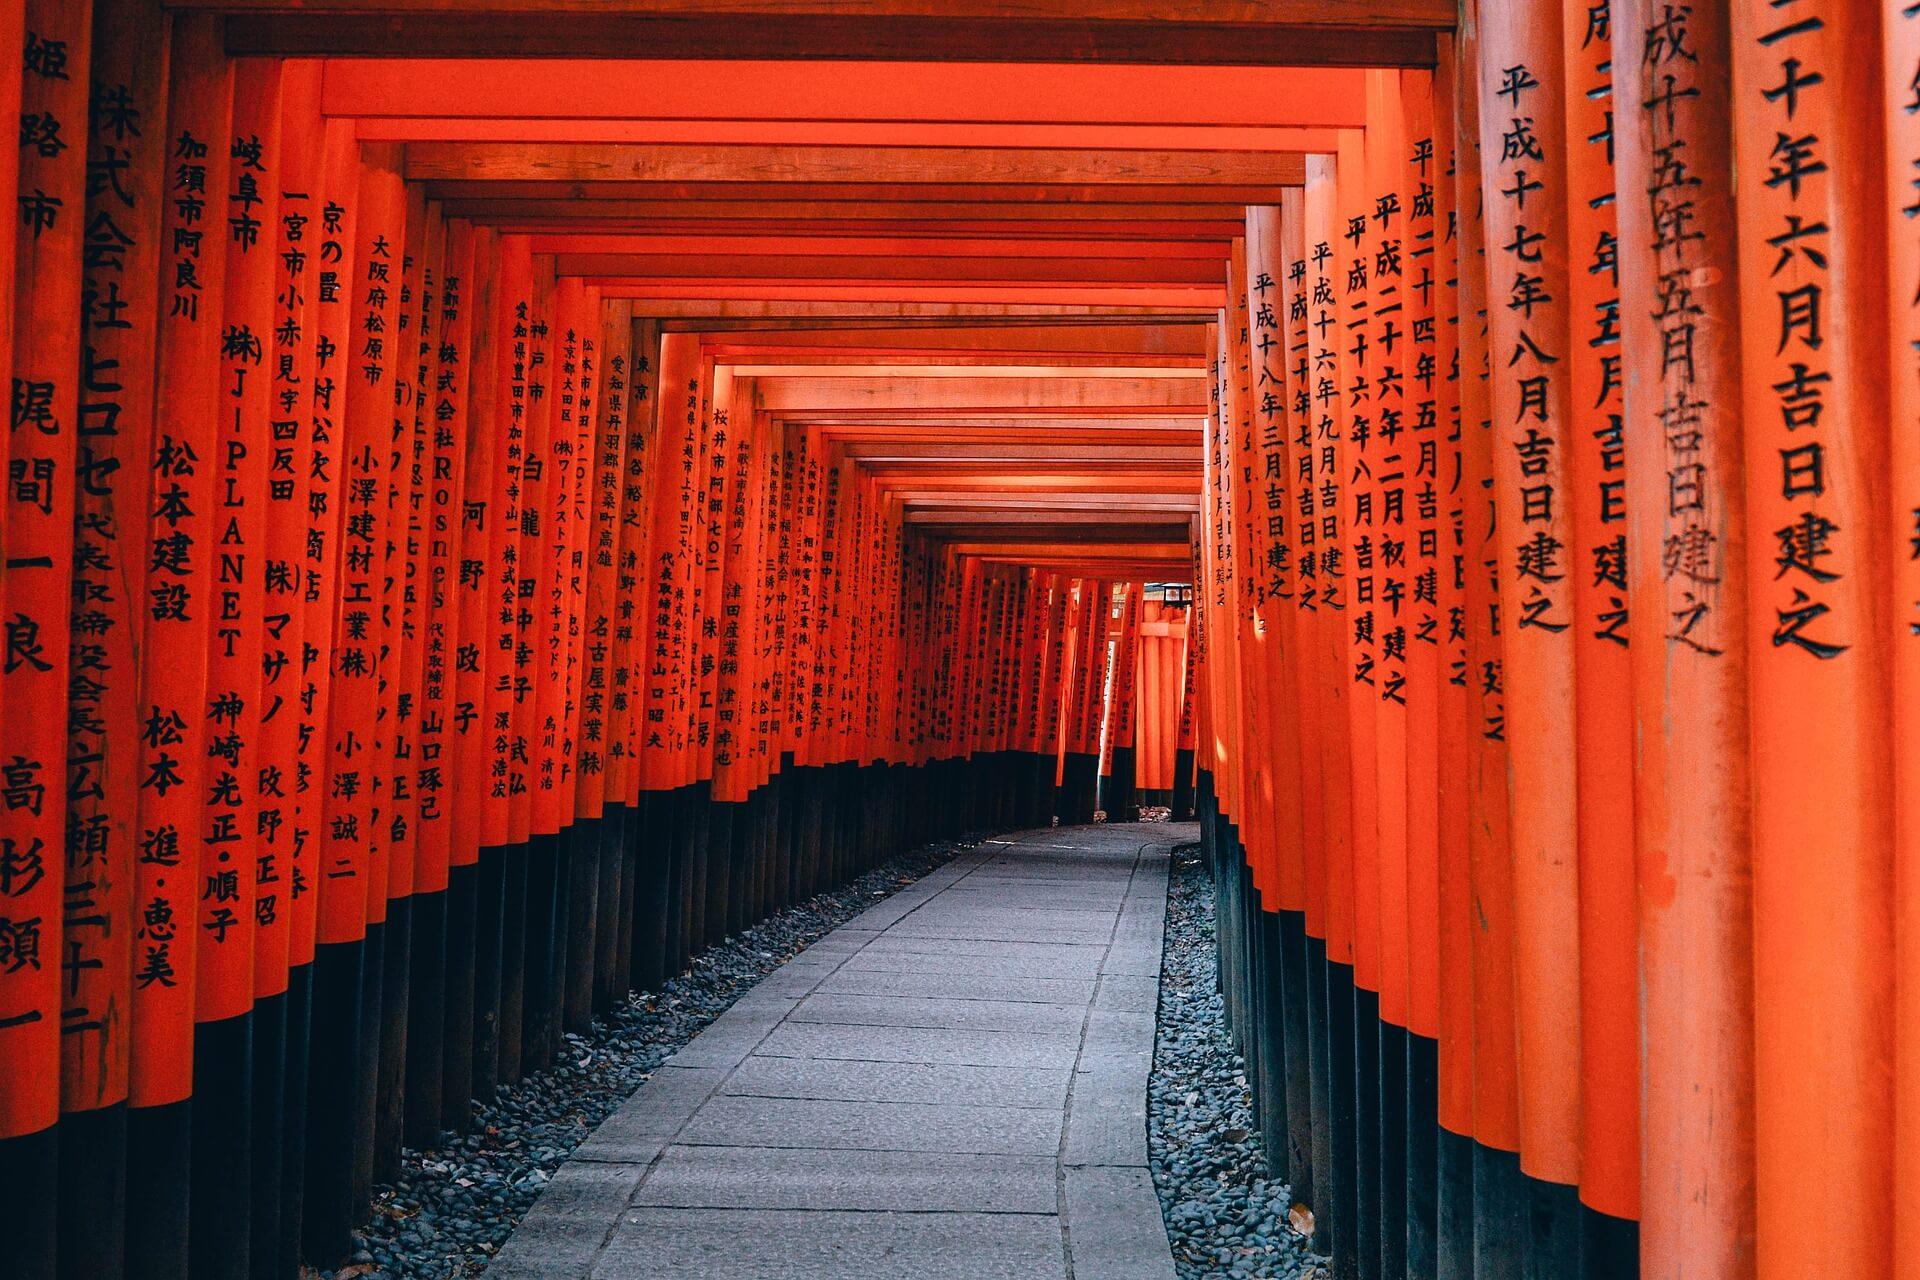 luna de miel en japon